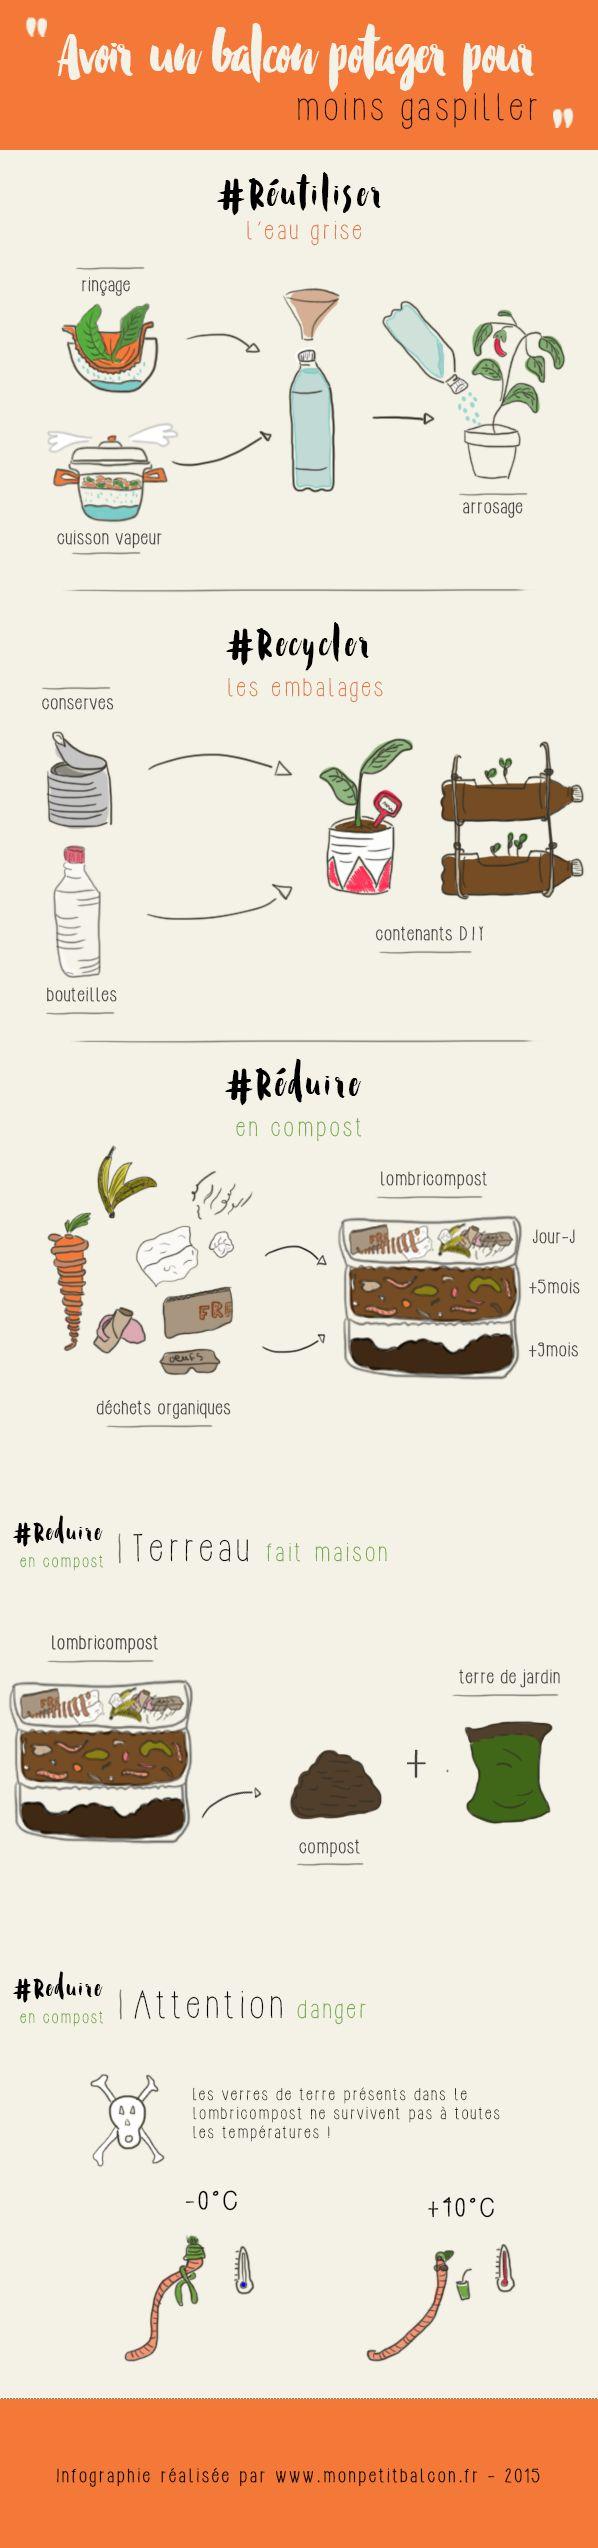 Infographie - Avoir un balcon potager pour moins gaspiller #compost #zerowaste…